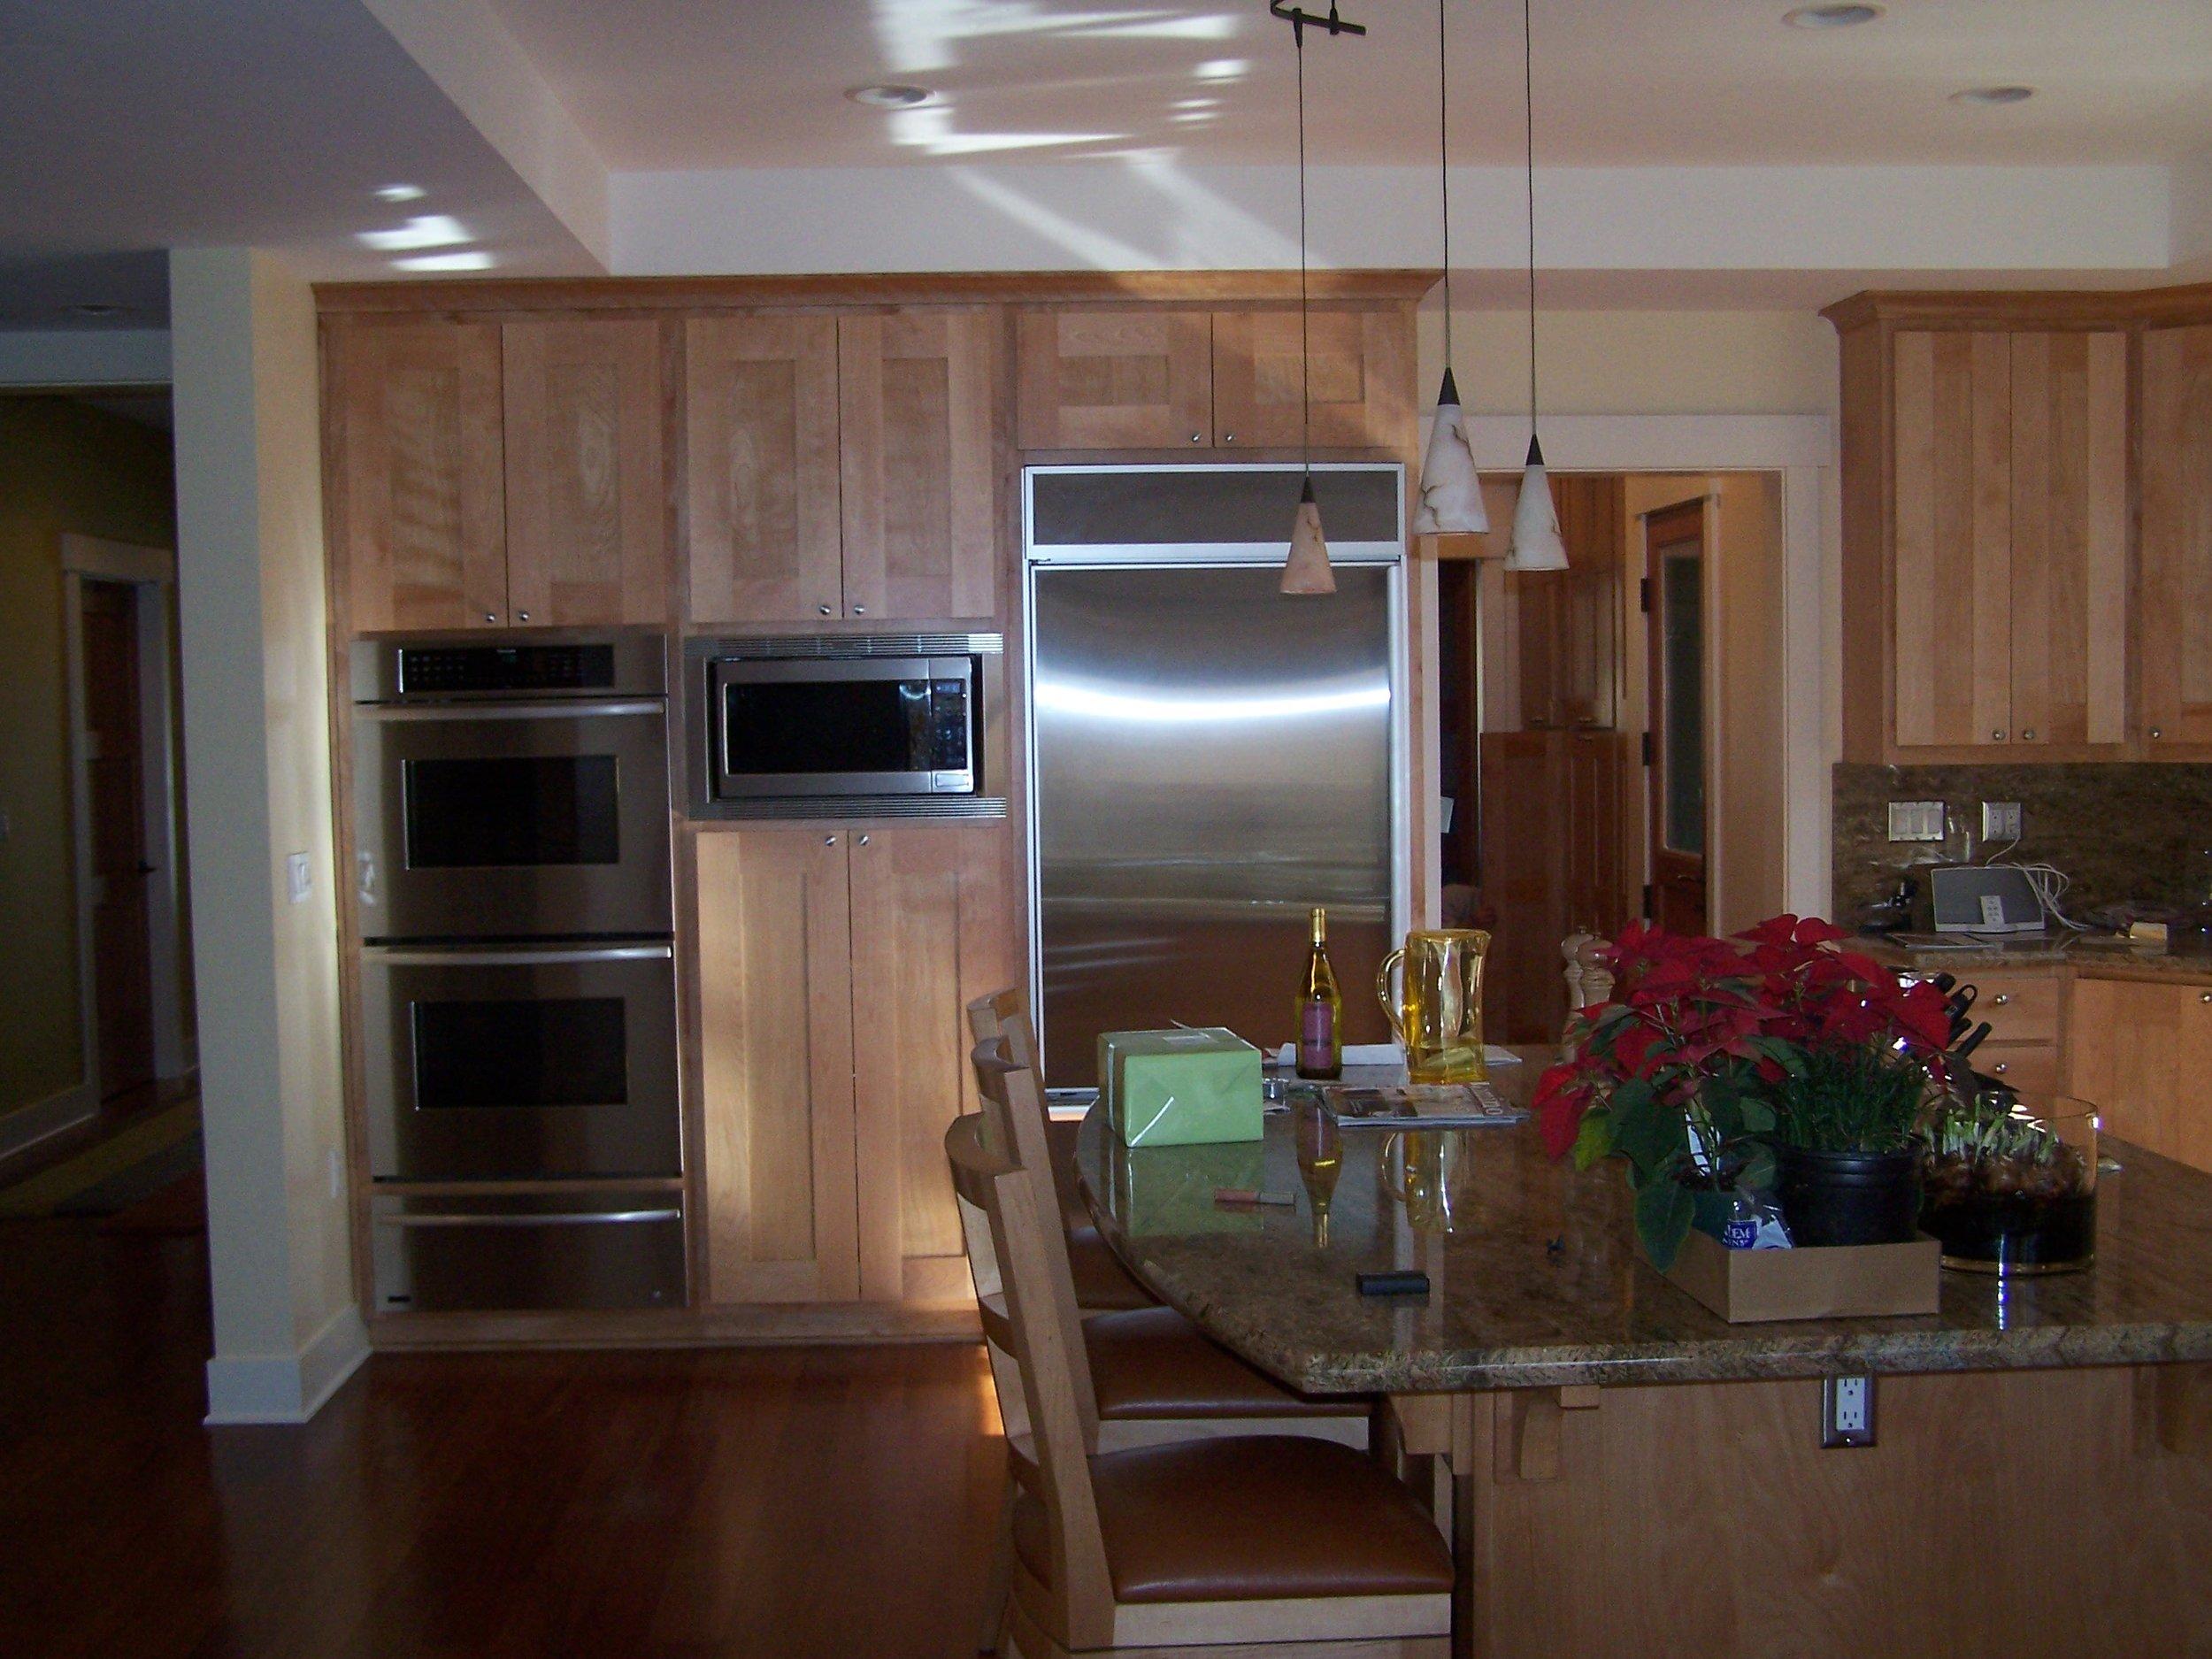 cabinet-system-for kitchen.JPG